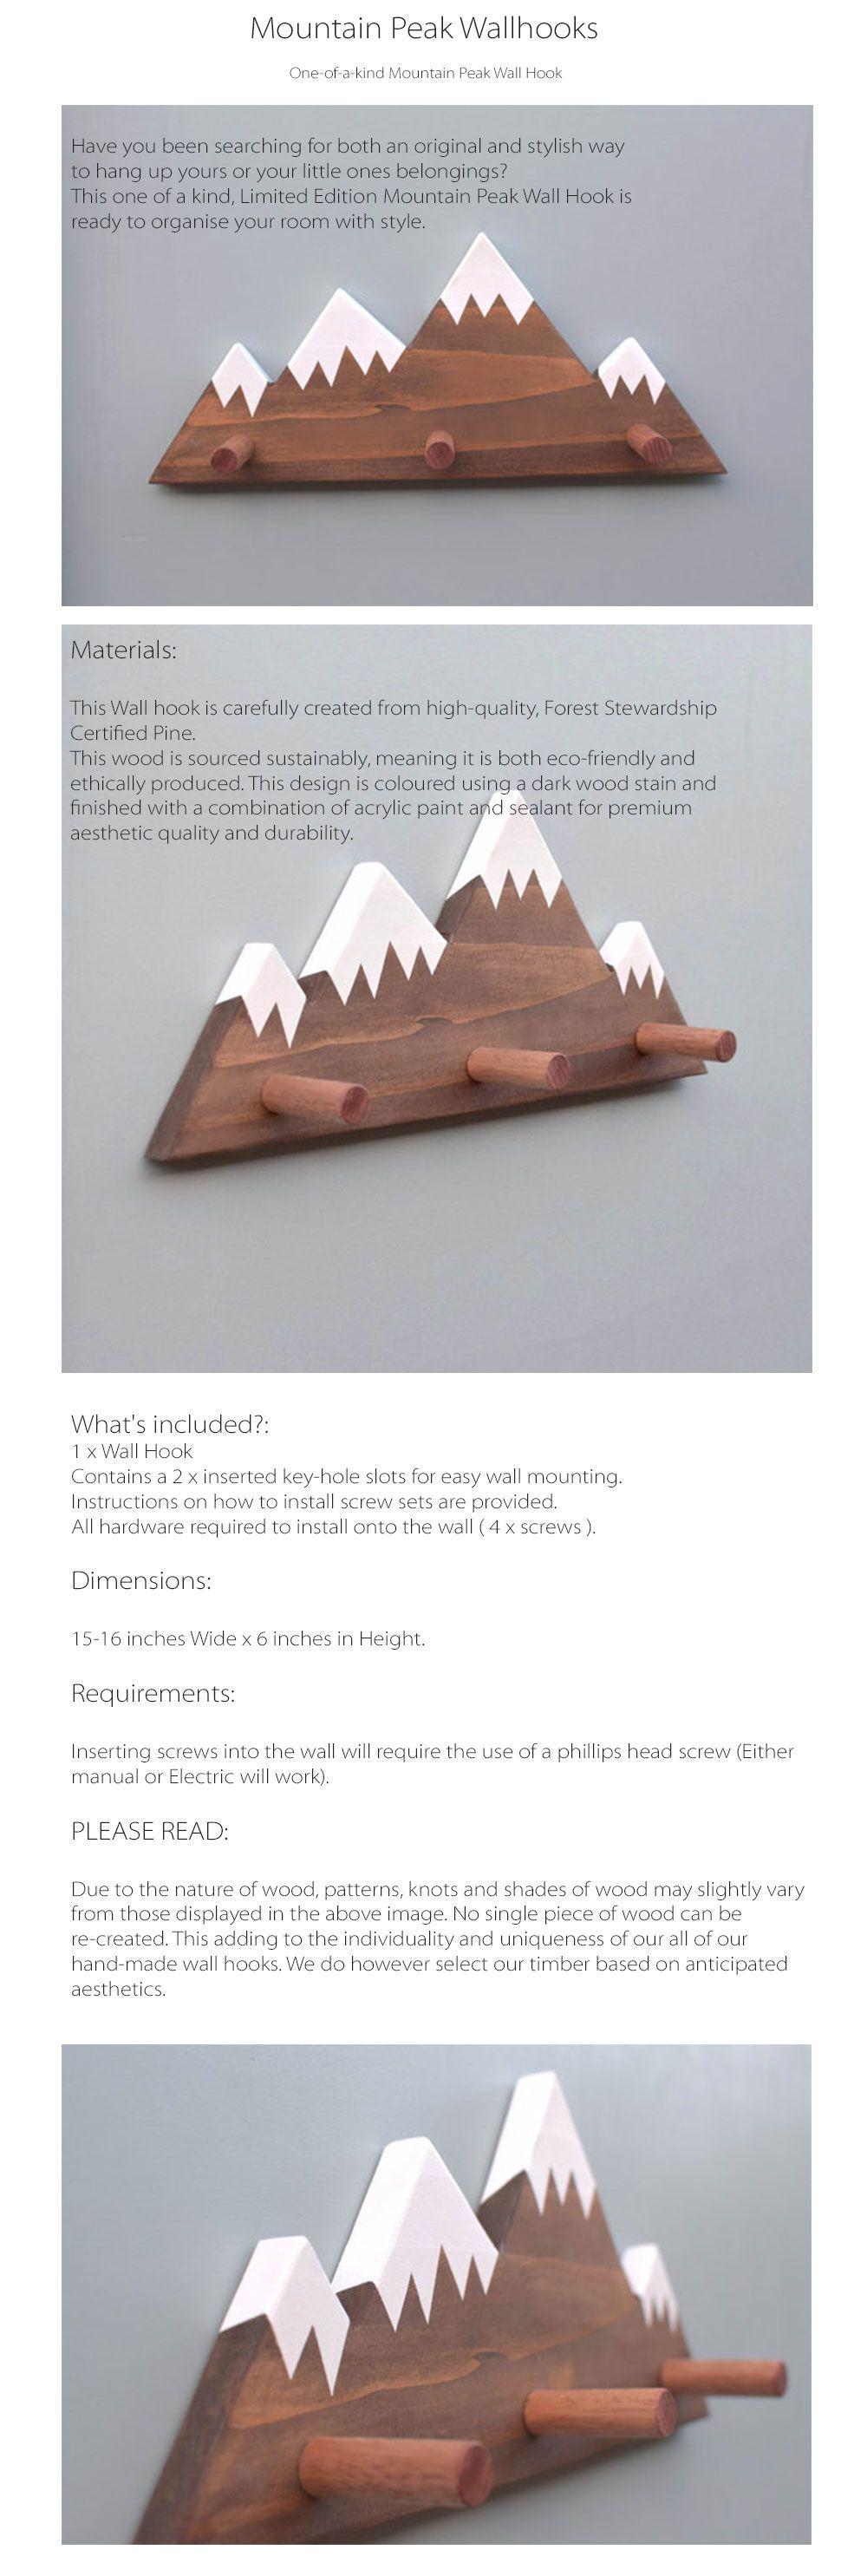 Mountain Peak Wallhooks Woodland Decor